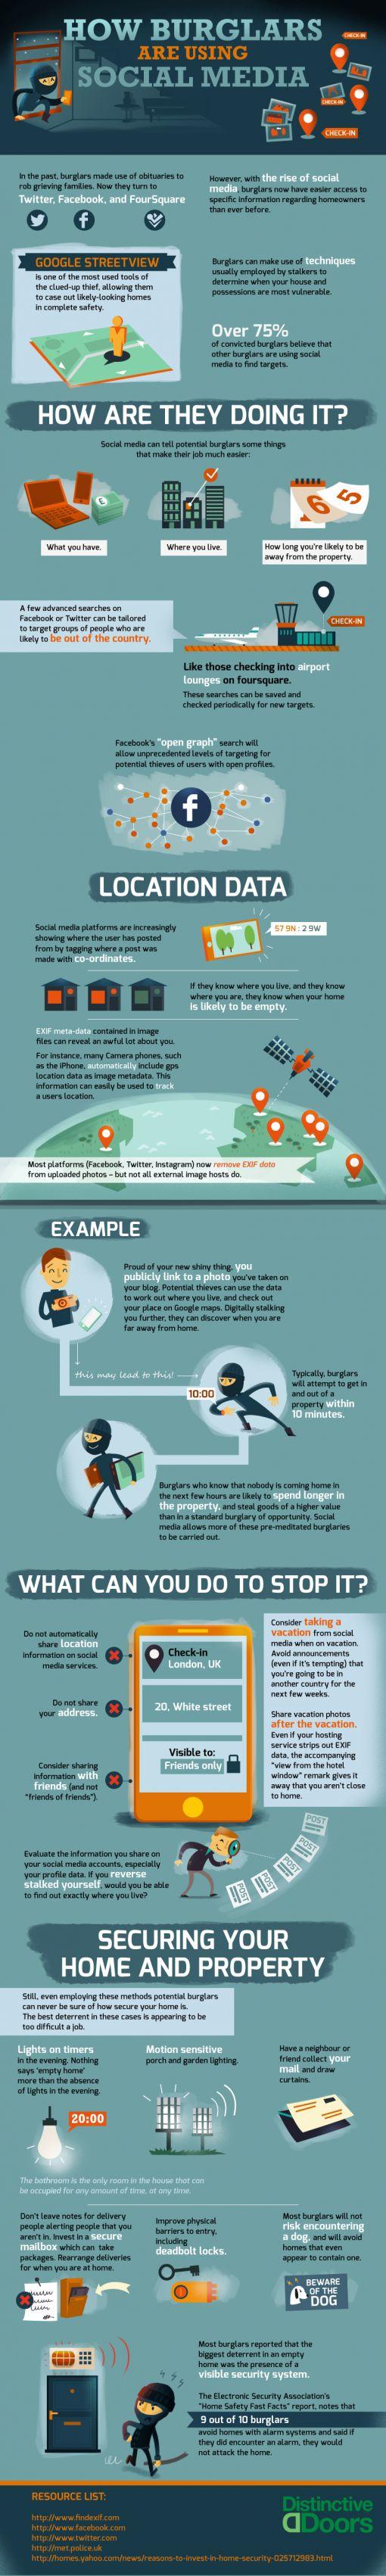 How_Burglars_Are_Using_Social_Media